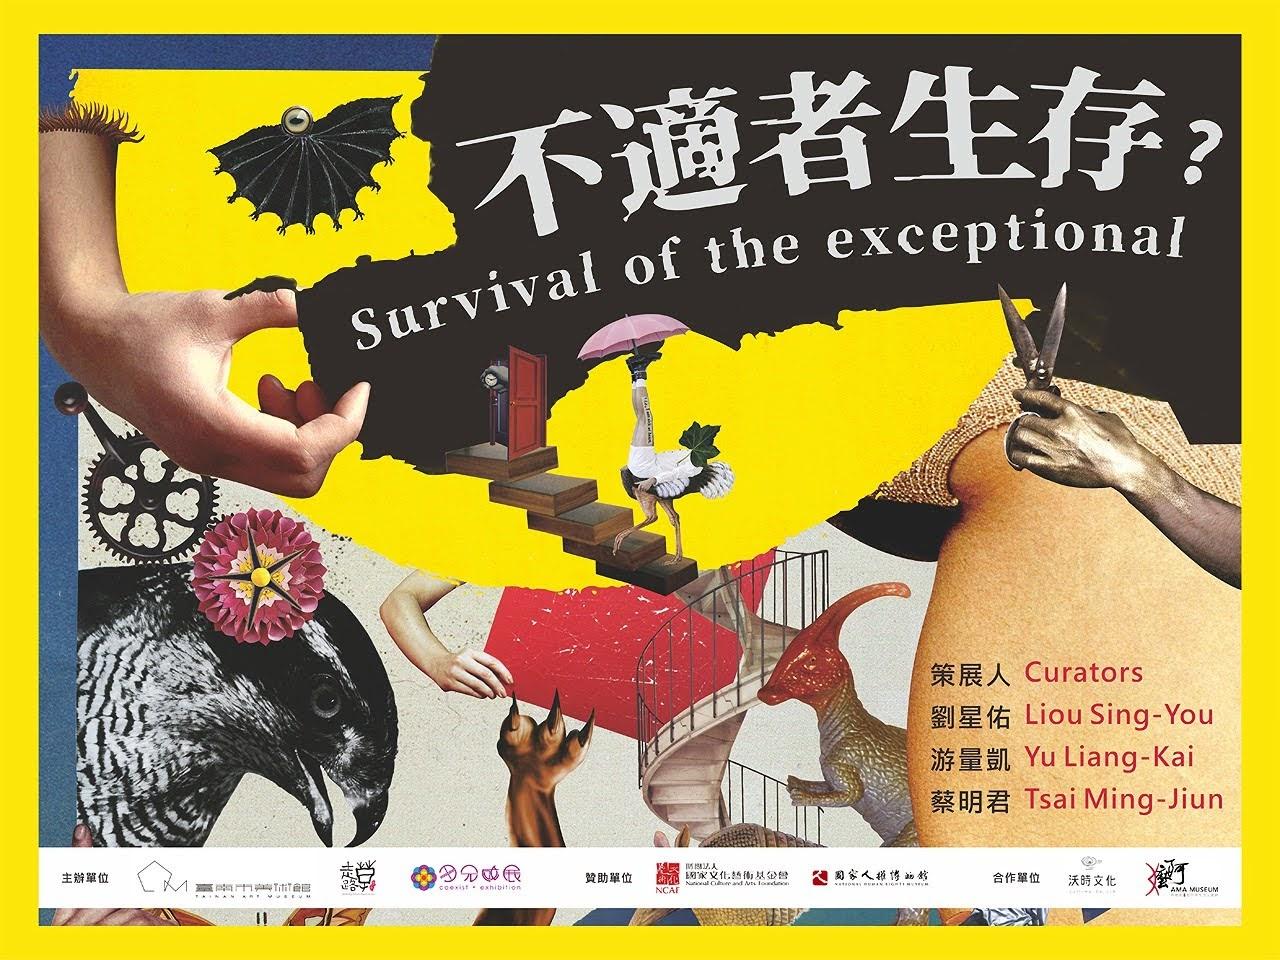 不適者生存?Survival of the Exceptional 活動